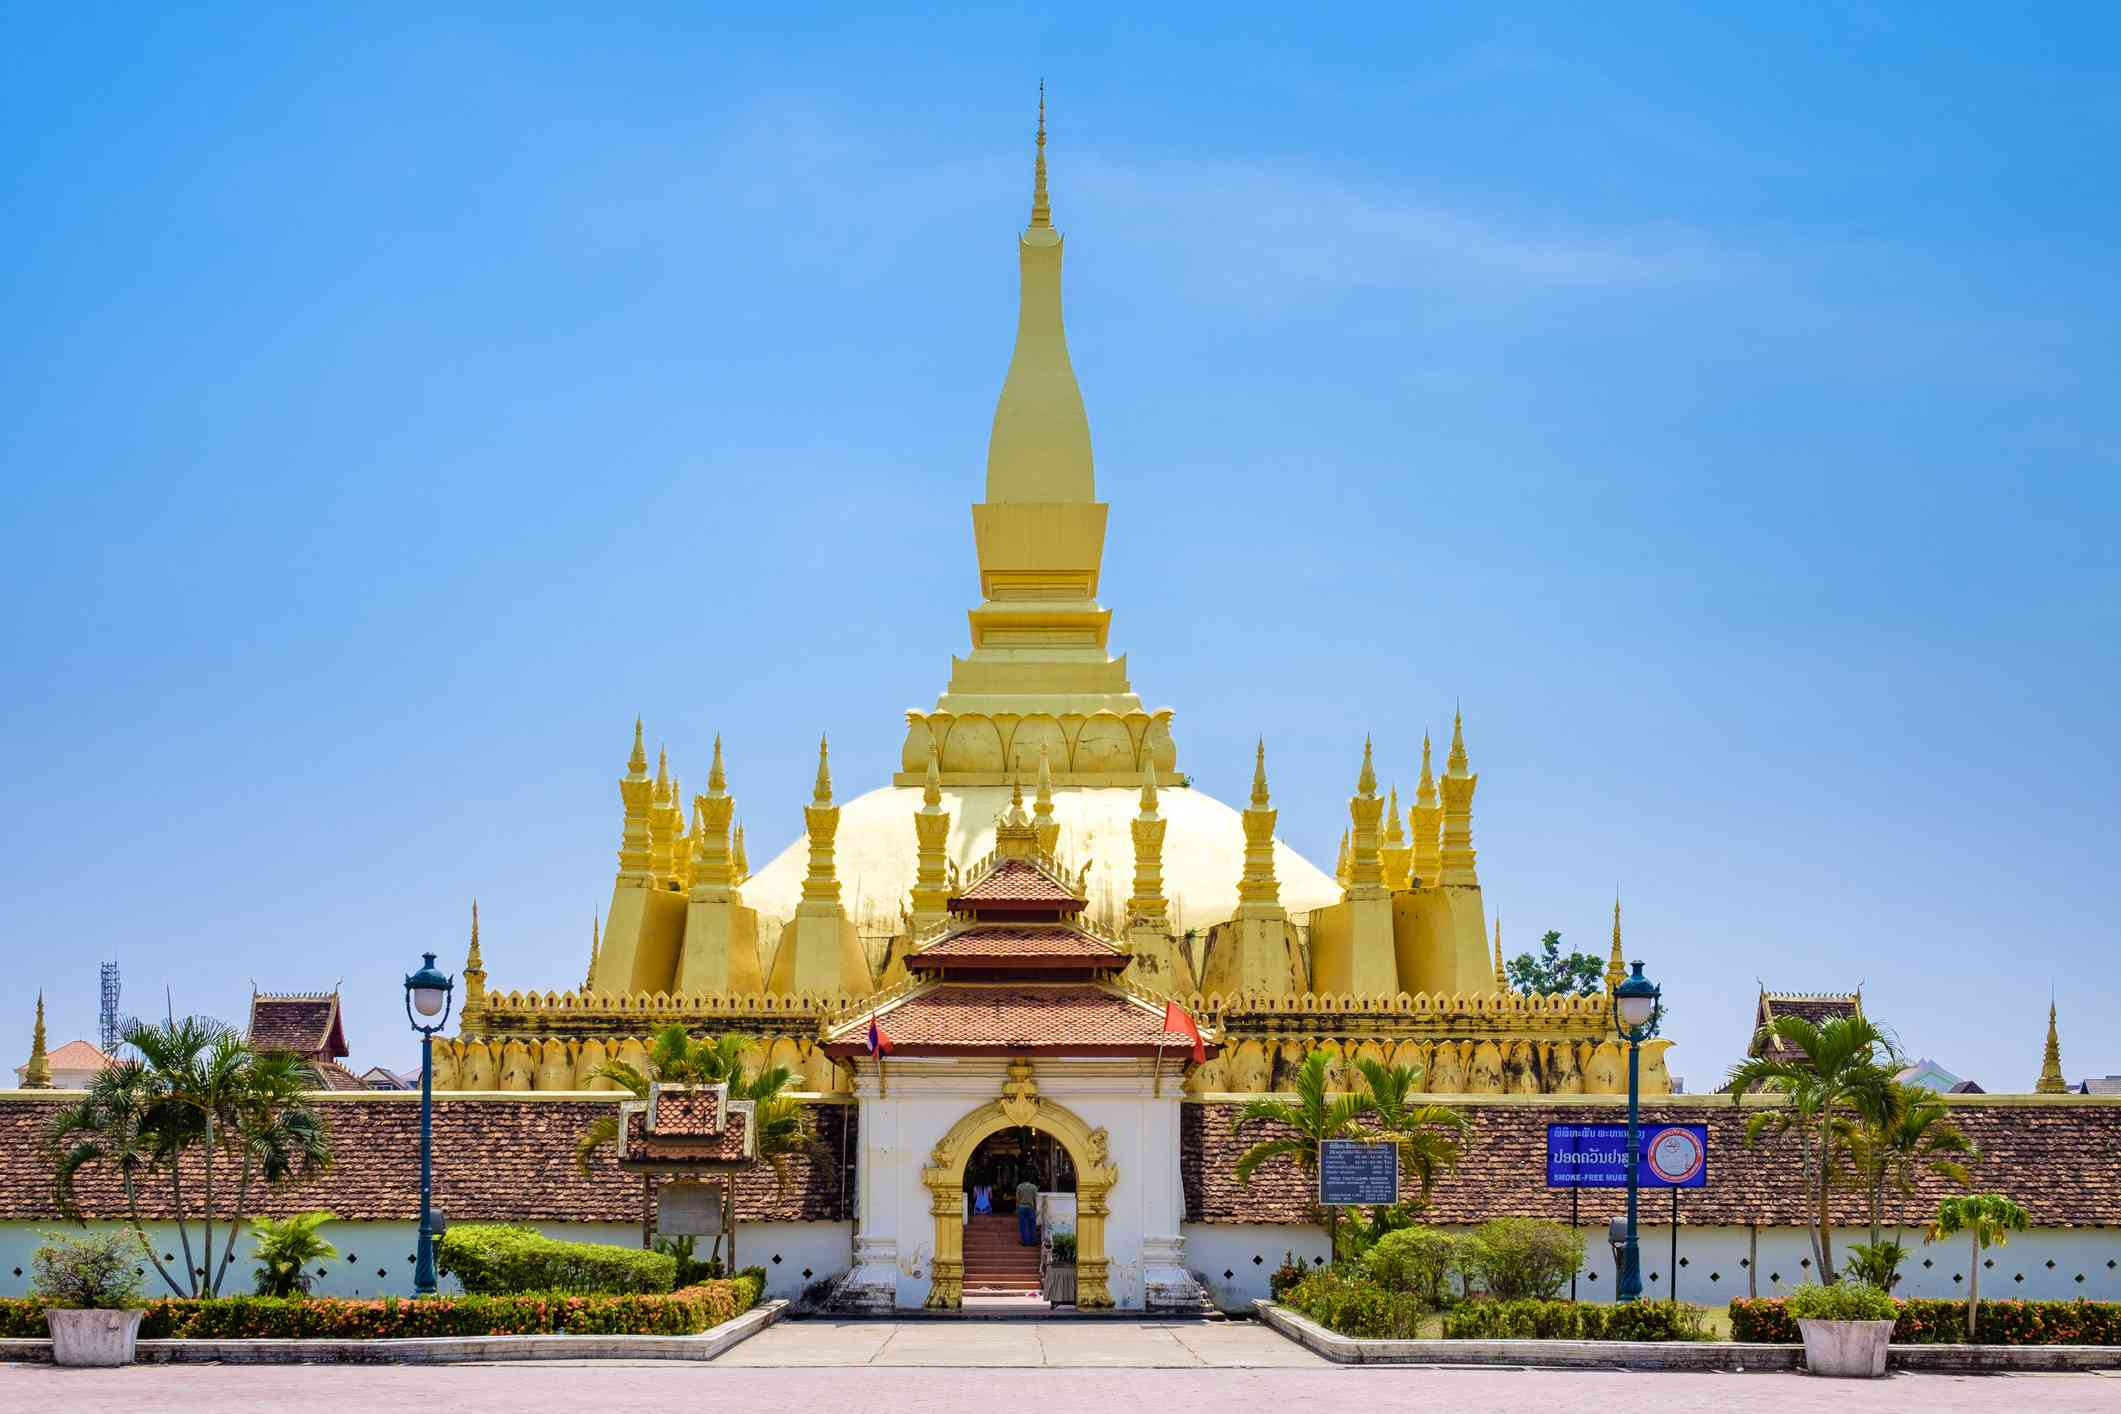 Pha That Luang golden stupa, Vientiane, Laos, Indochina, Southeast Asia